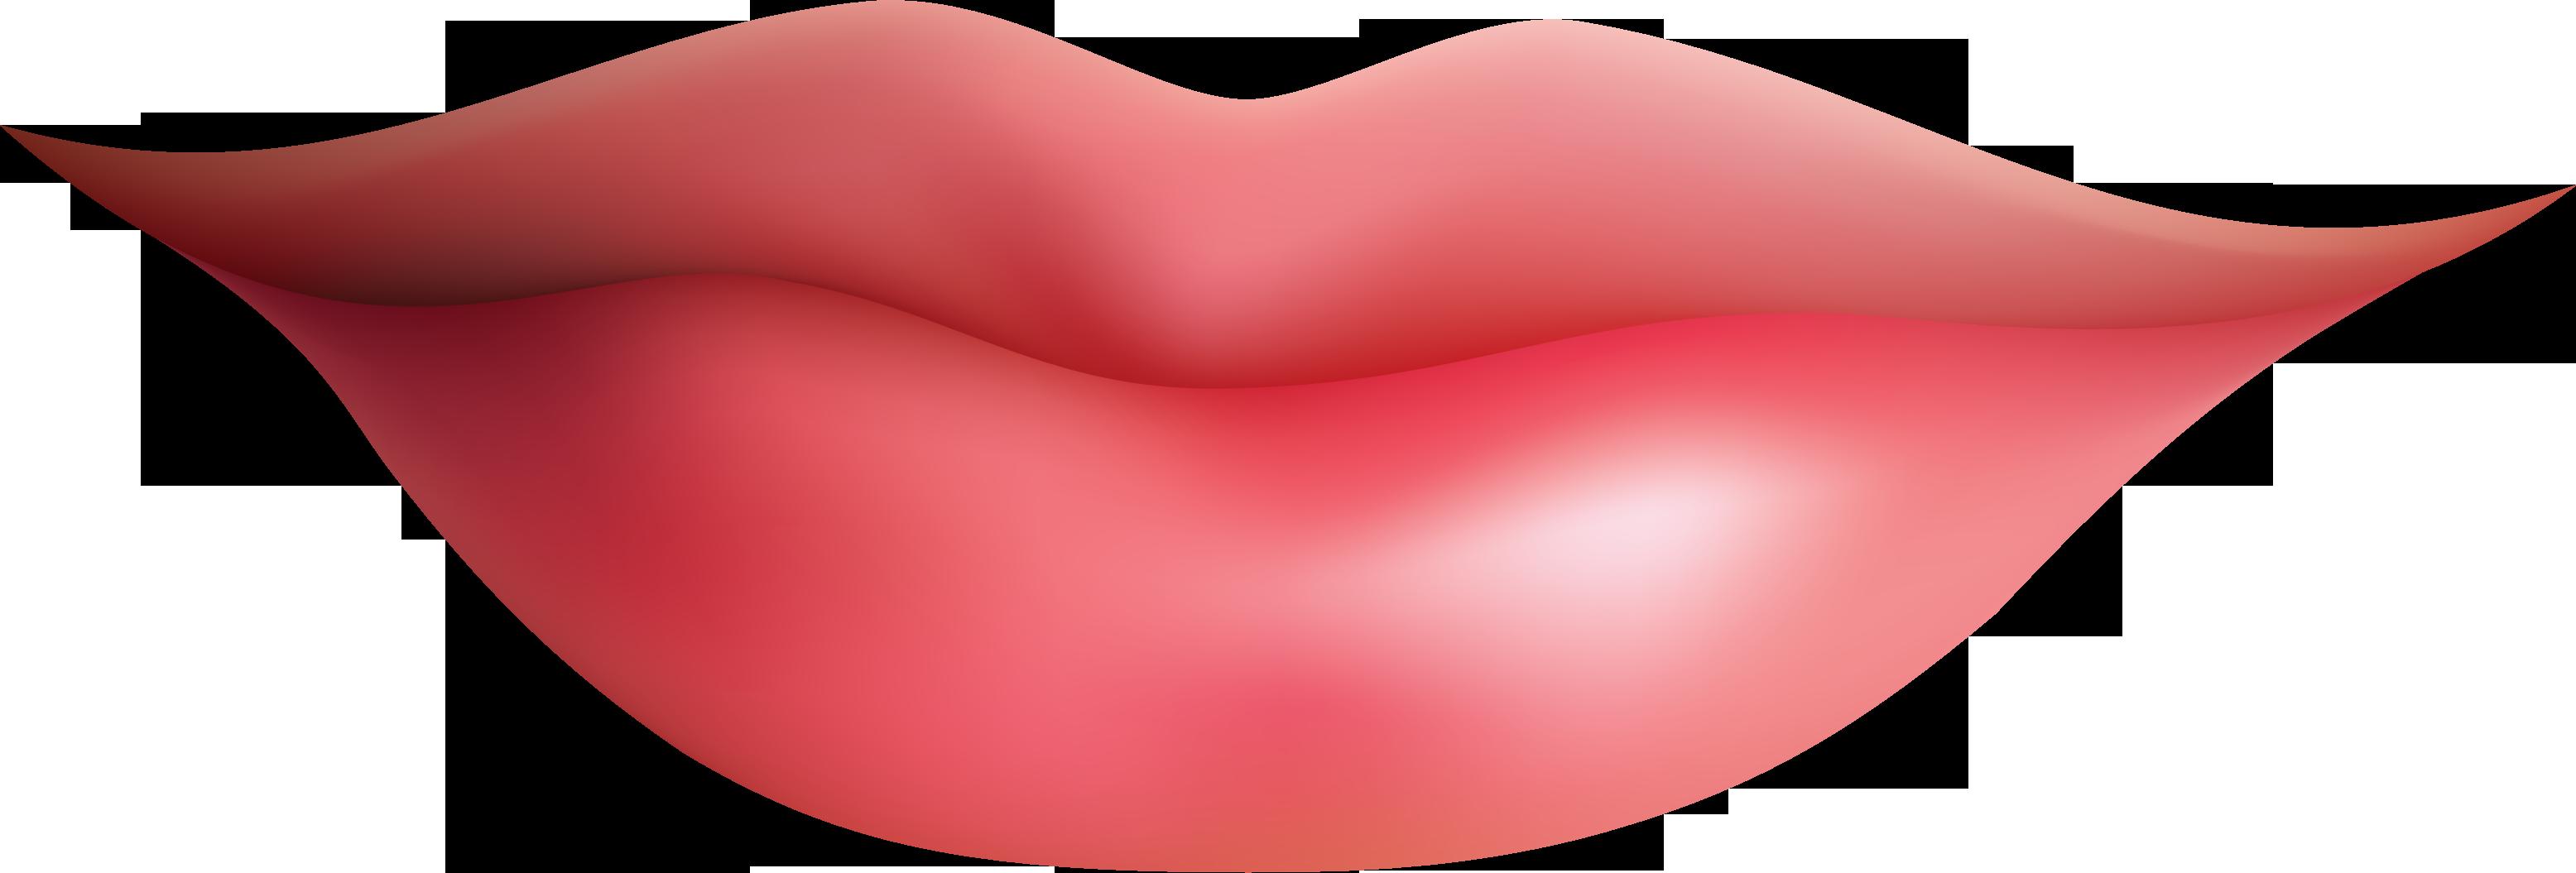 Clipart lips clipart image 9 - Lip Clip Art